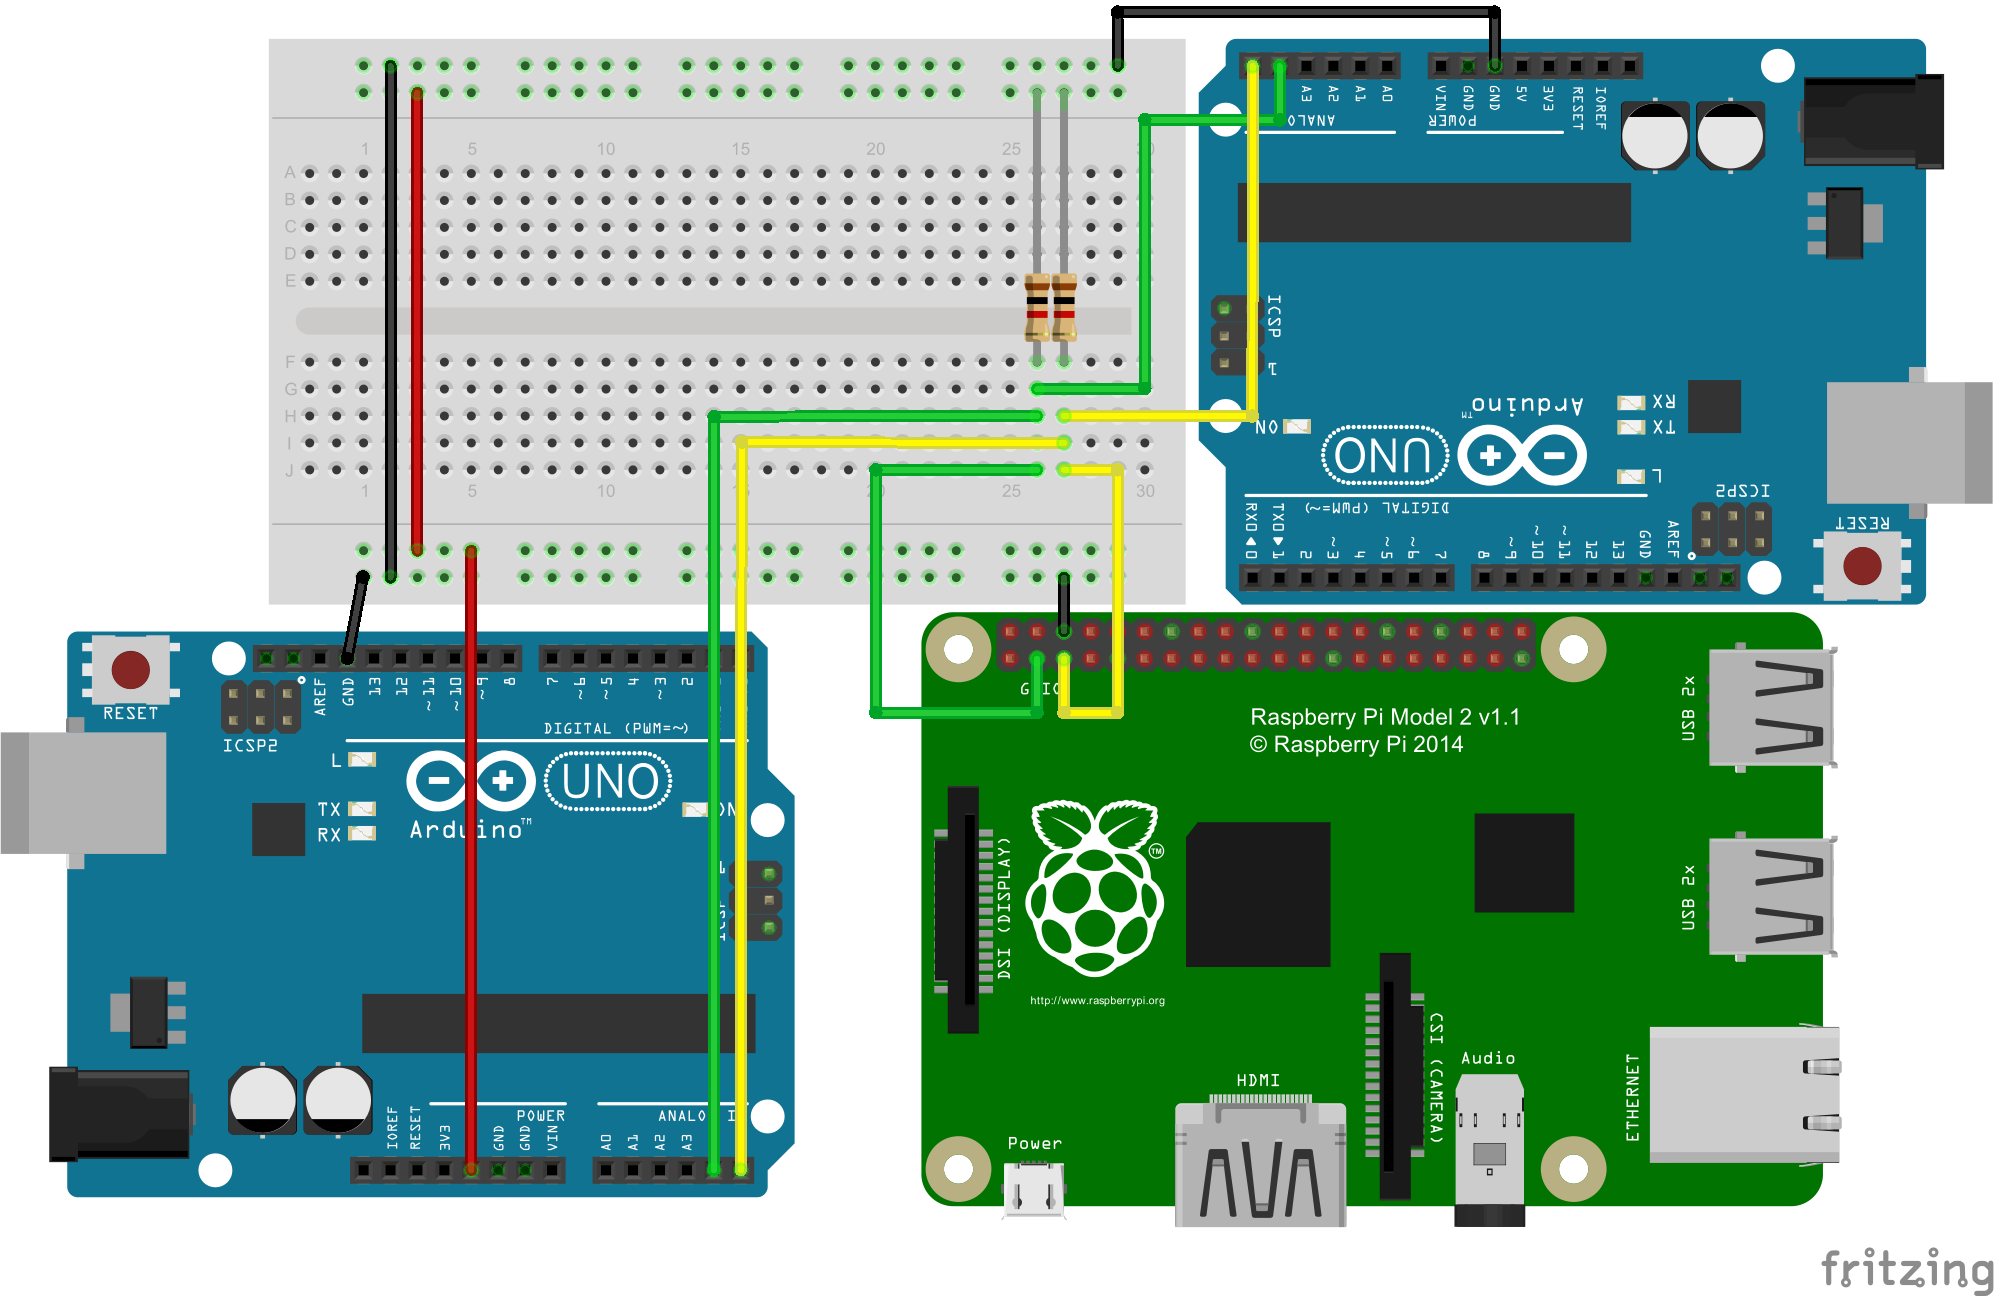 RaspberryPi I2C Schematic